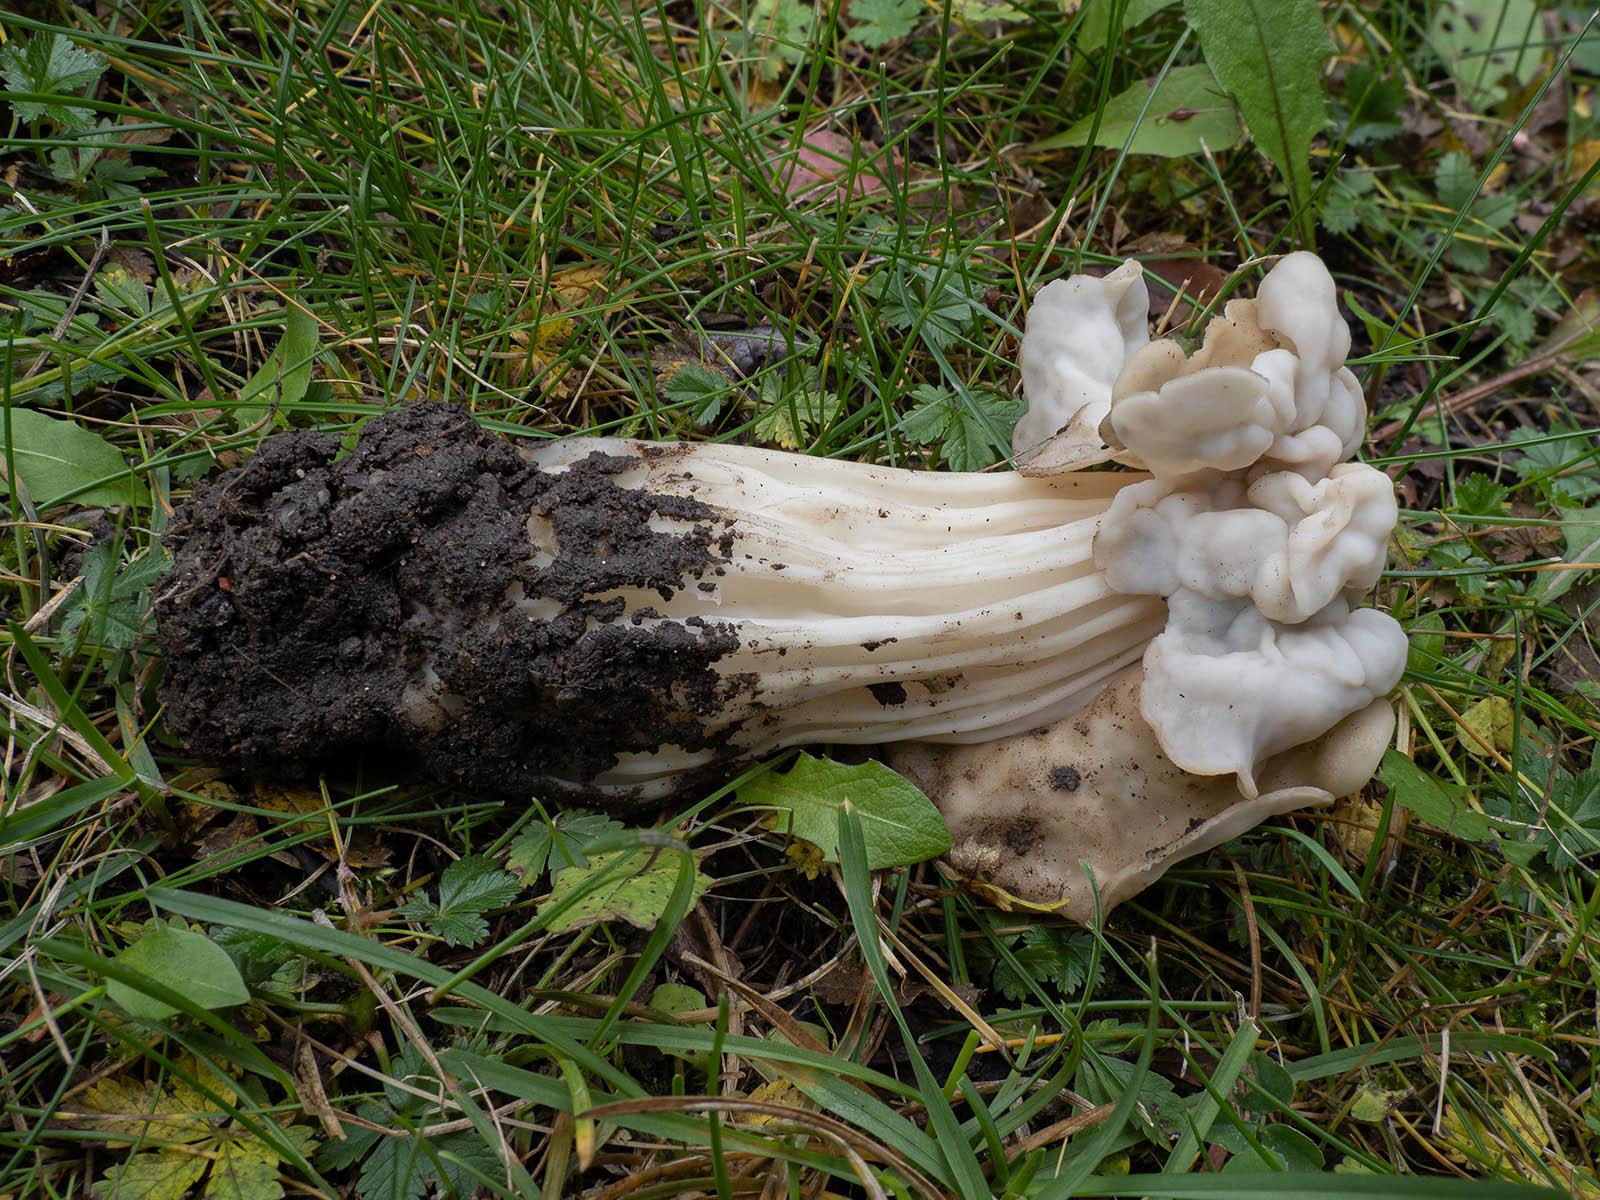 Лопастник курчавый (<a class=fungi target=catalog href=http://mycoweb.ru/GIF/catalog/catalog.php?level=picture&id=583>Helvella crispa</a>). Автор фото: Сутормина Марина